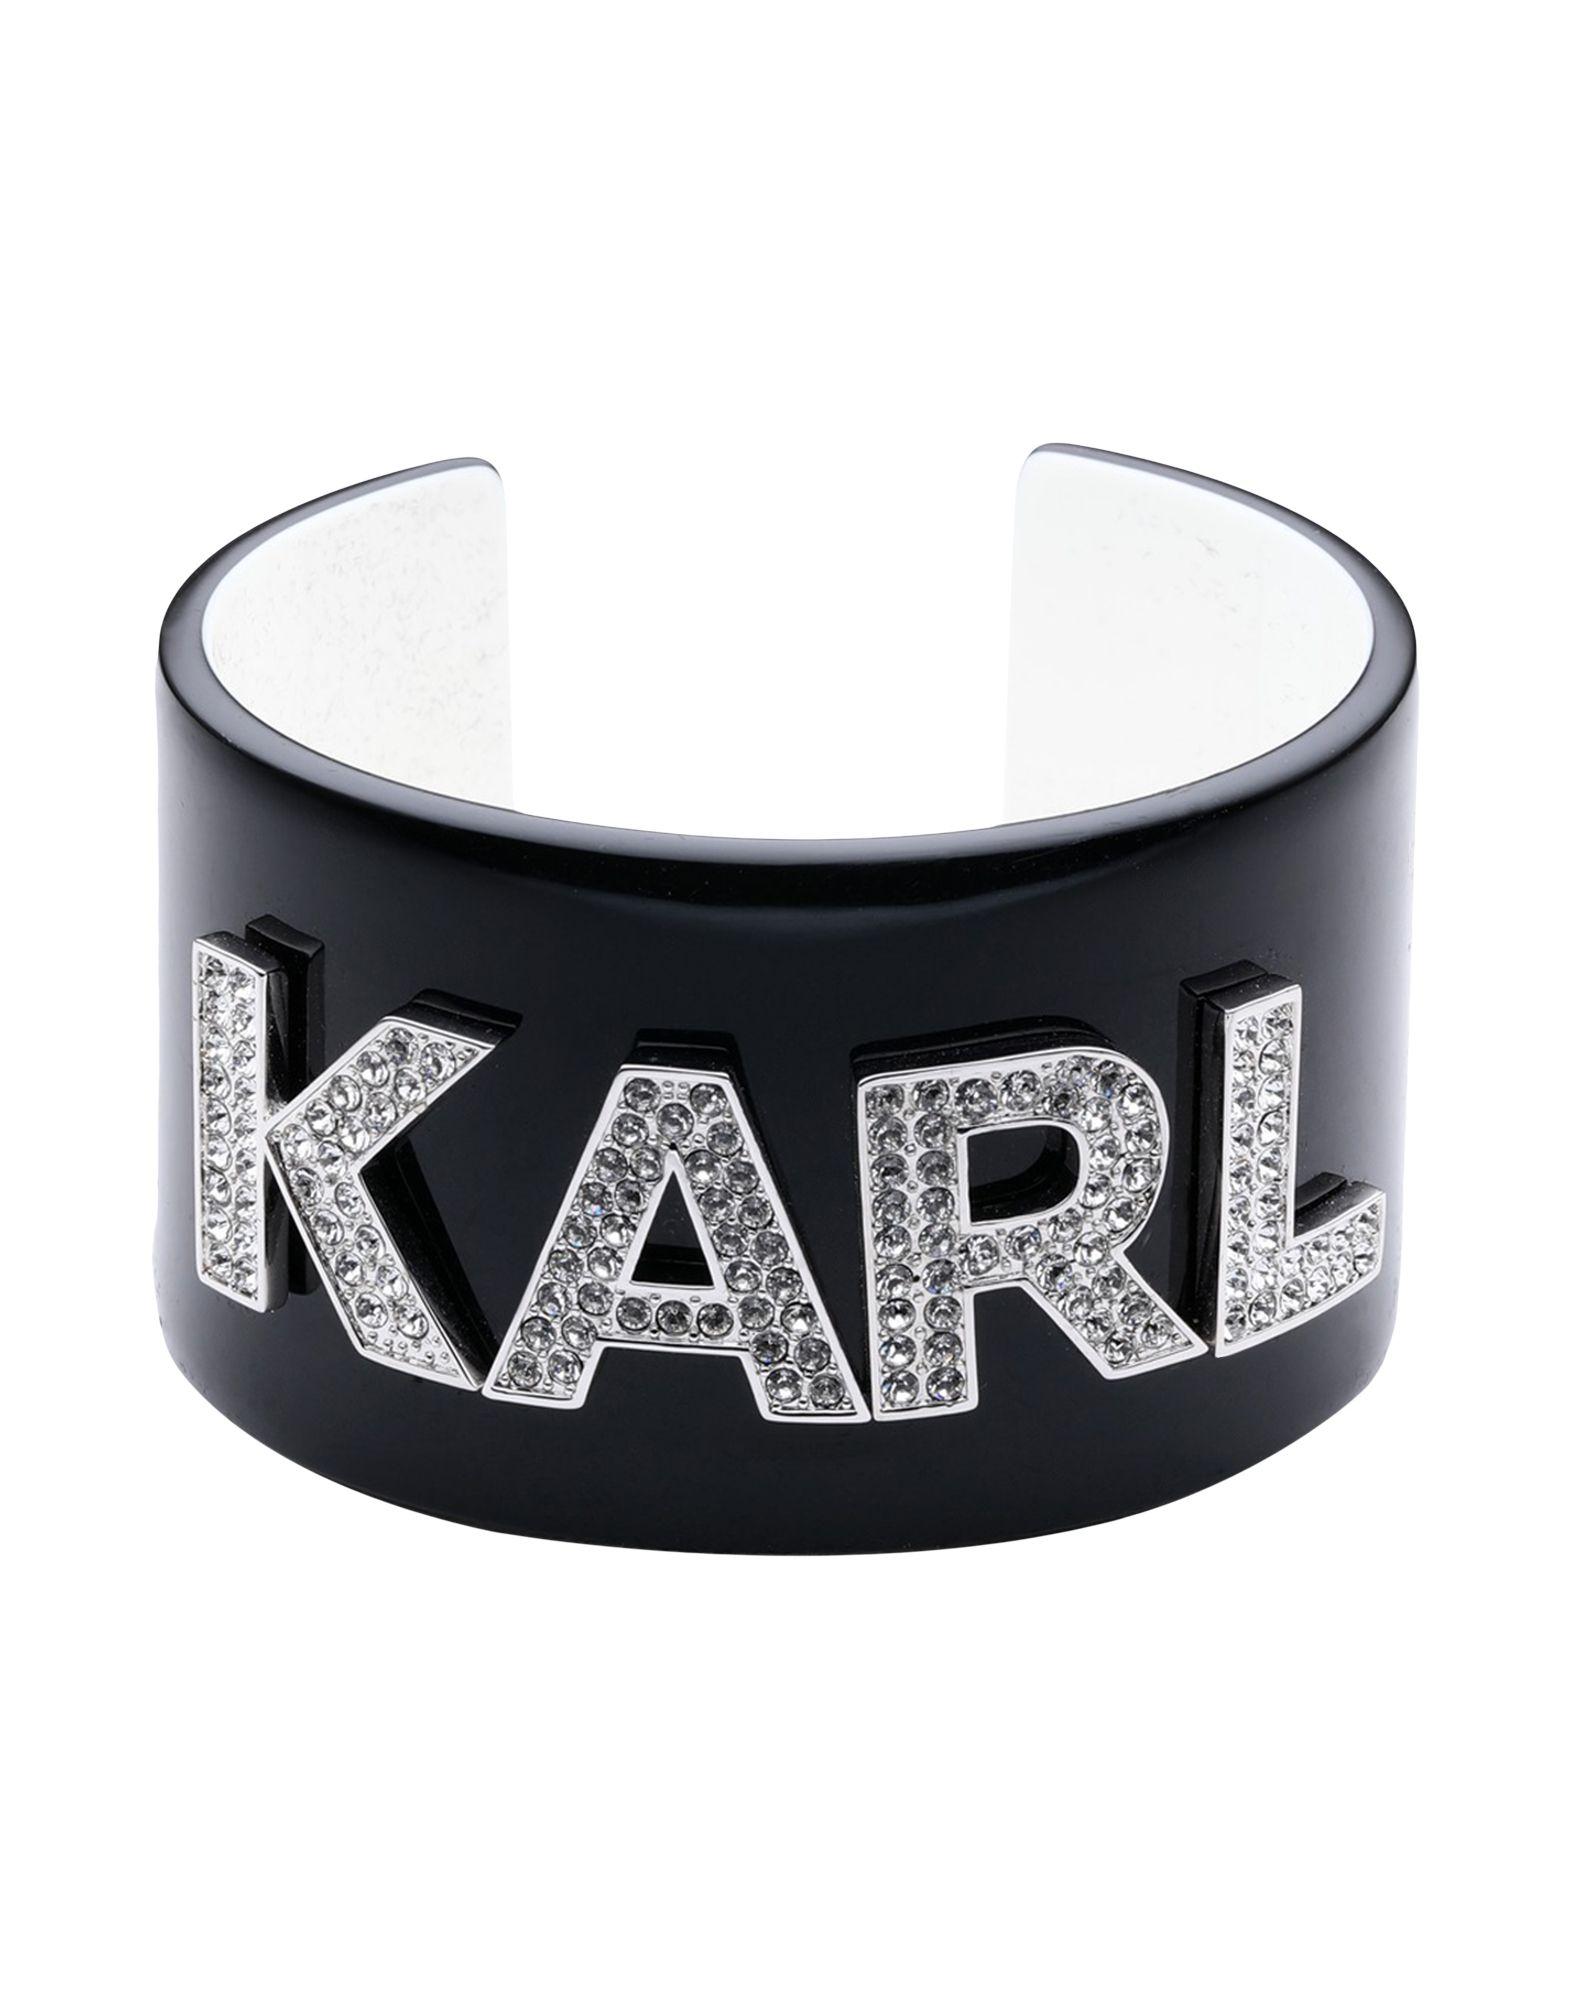 KARL LAGERFELD Bracelets - Item 50242374